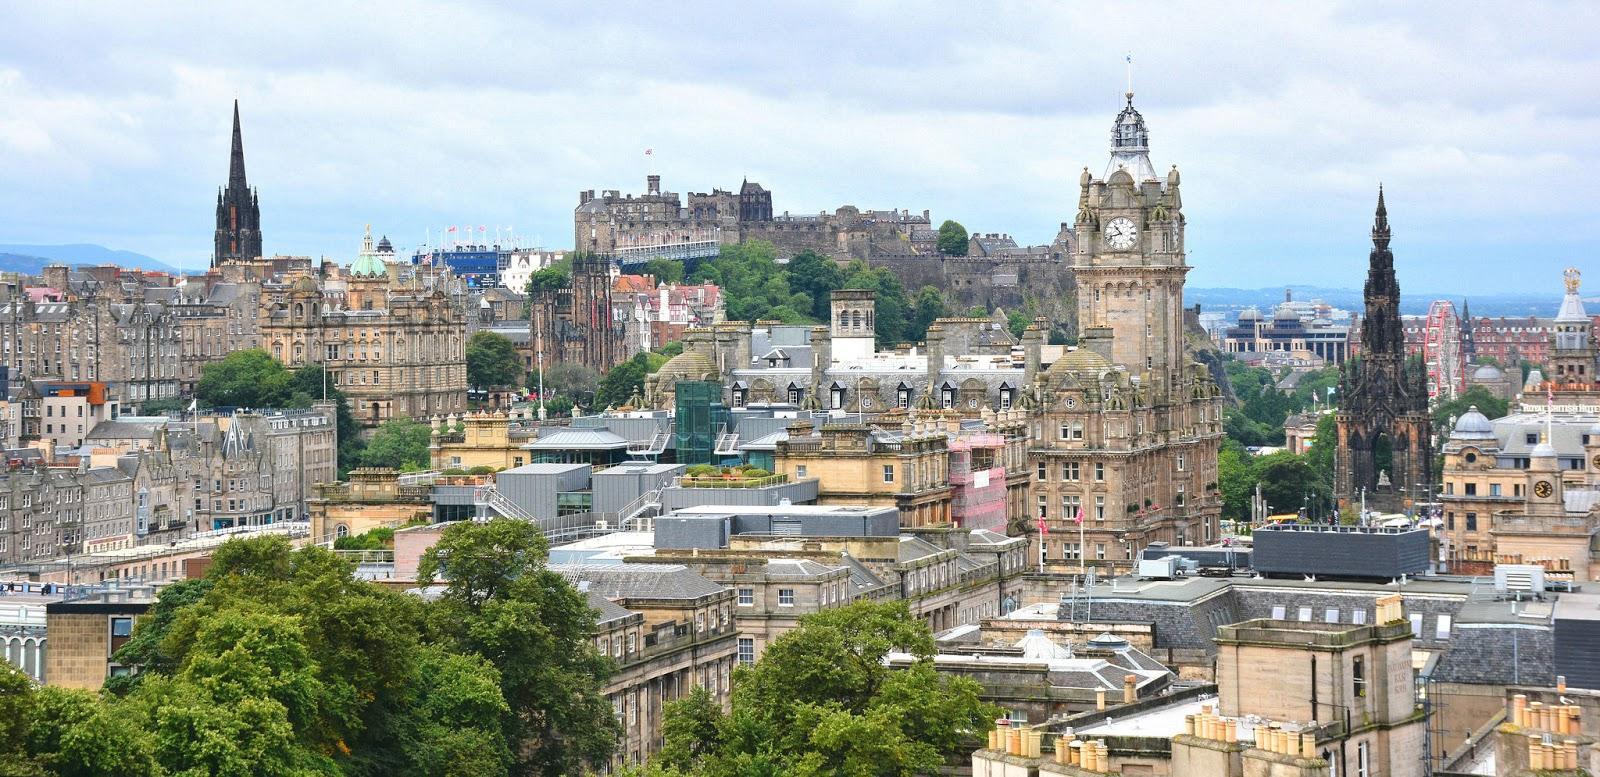 škotska-edinburg-putovanja-travel-ujedinjeno_kraljevstvo-Royal_Mile-Edinburški_dvorac-Holyrood_park